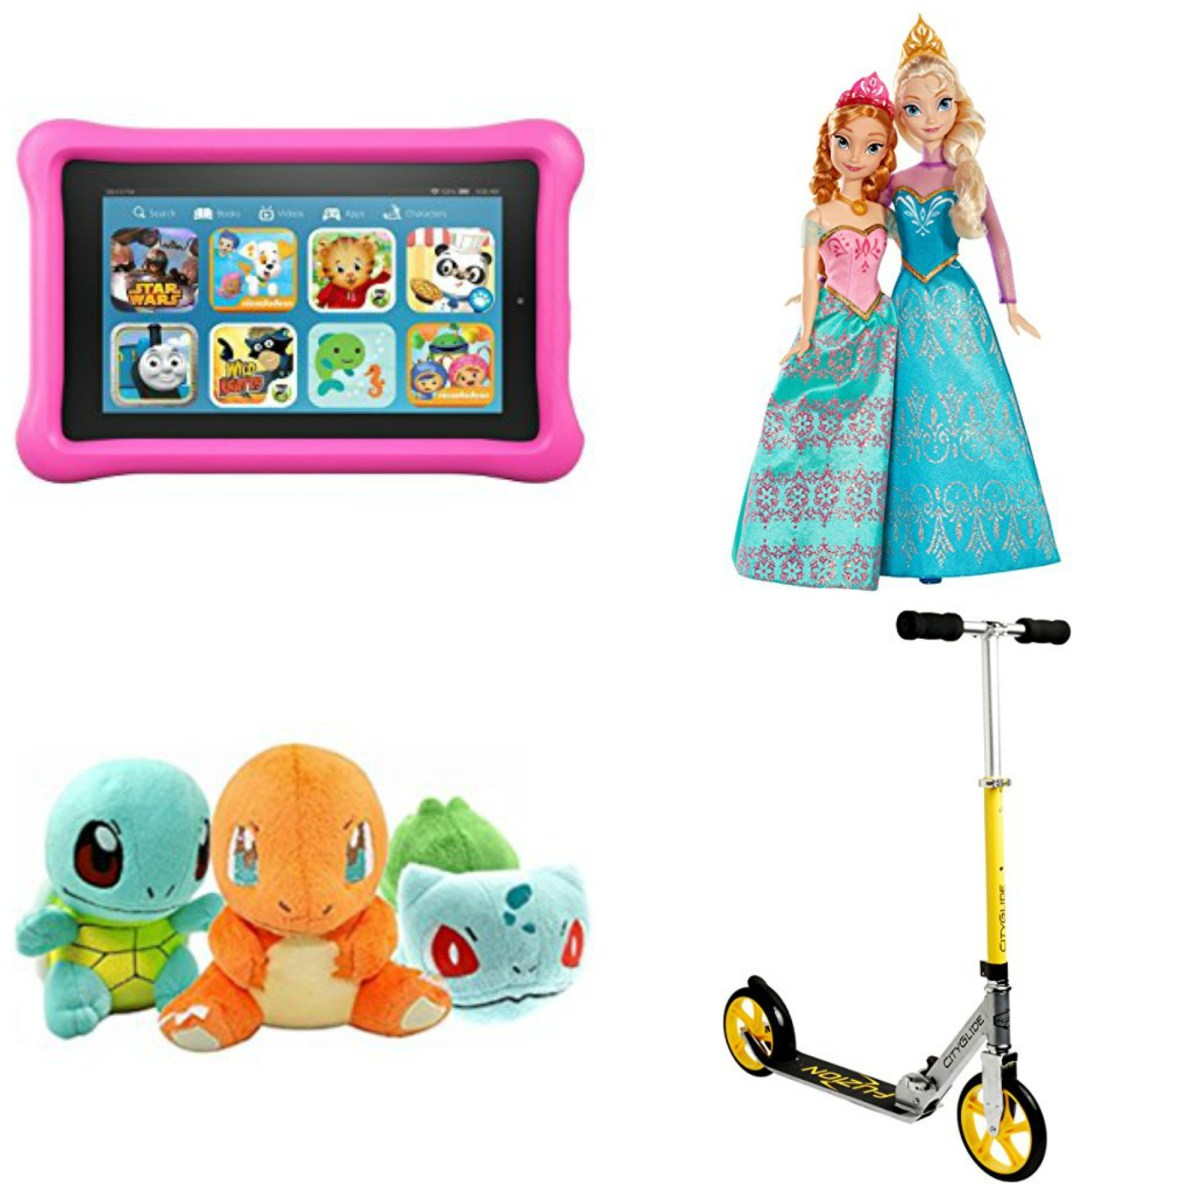 Amazon Kids Gift Collage